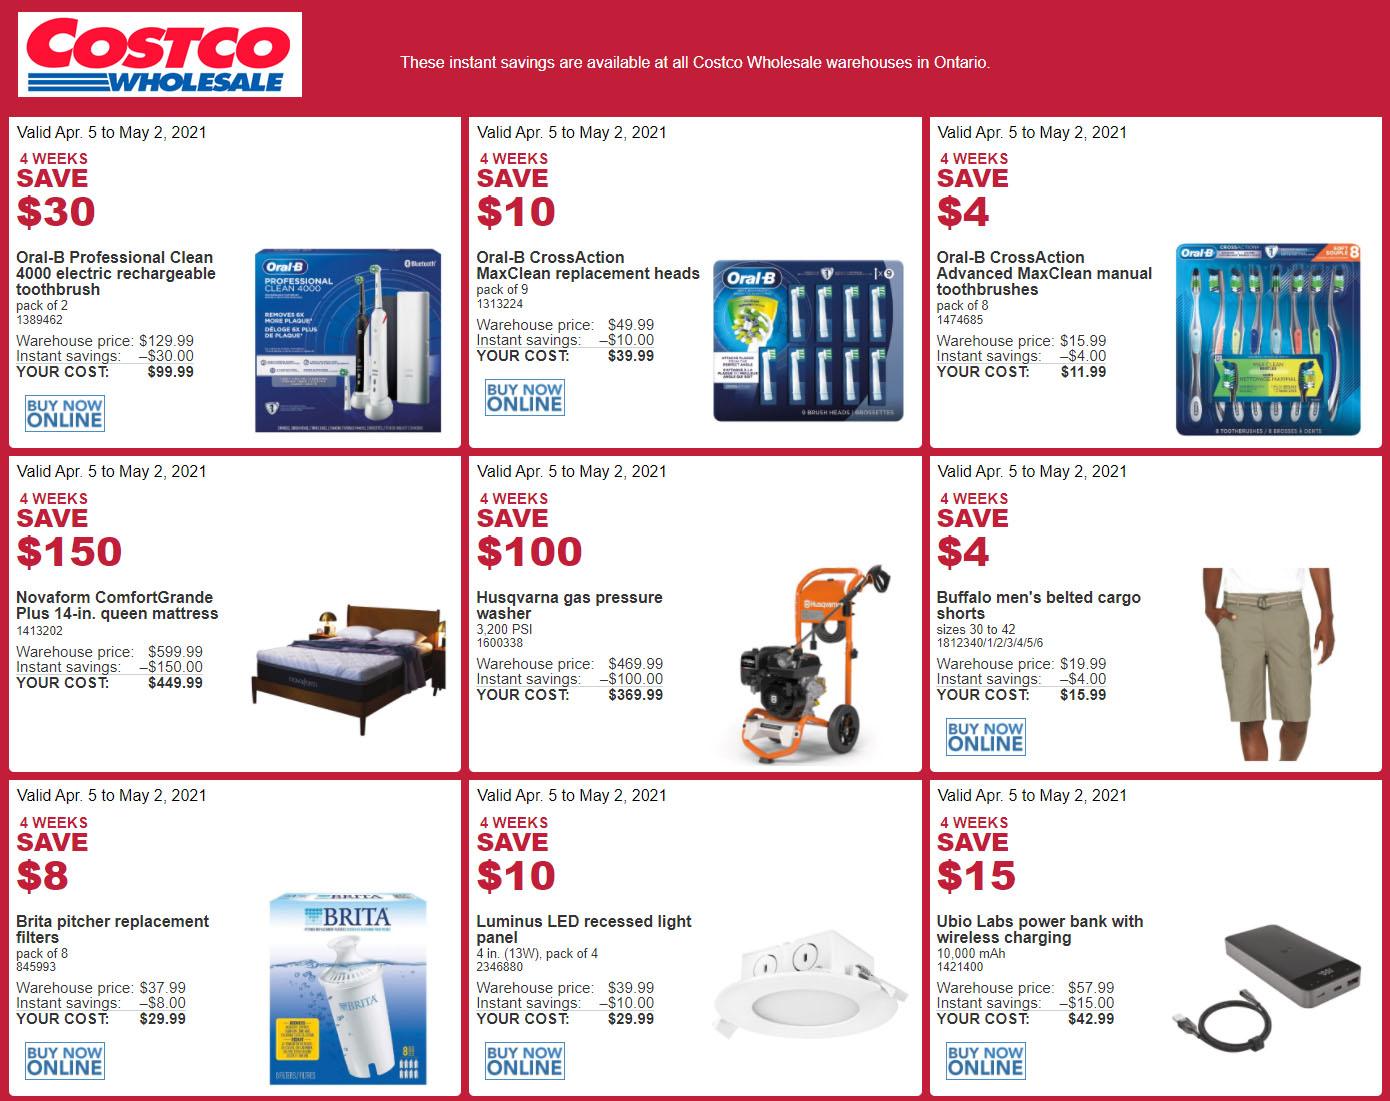 Costco - Monthly Savings